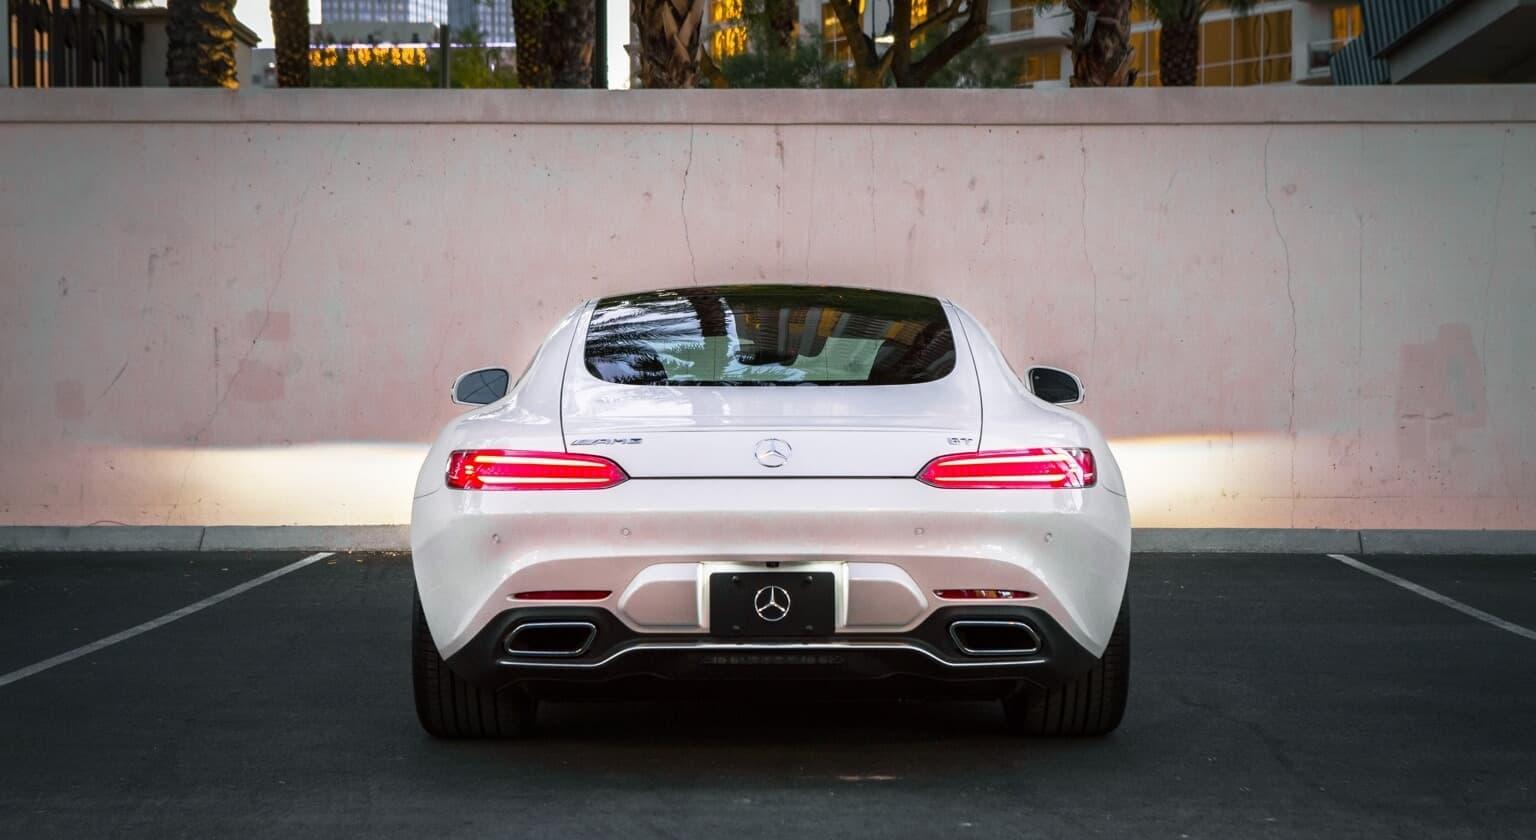 Exotic Luxury Car Rentals In Las Vegas Nv Turo